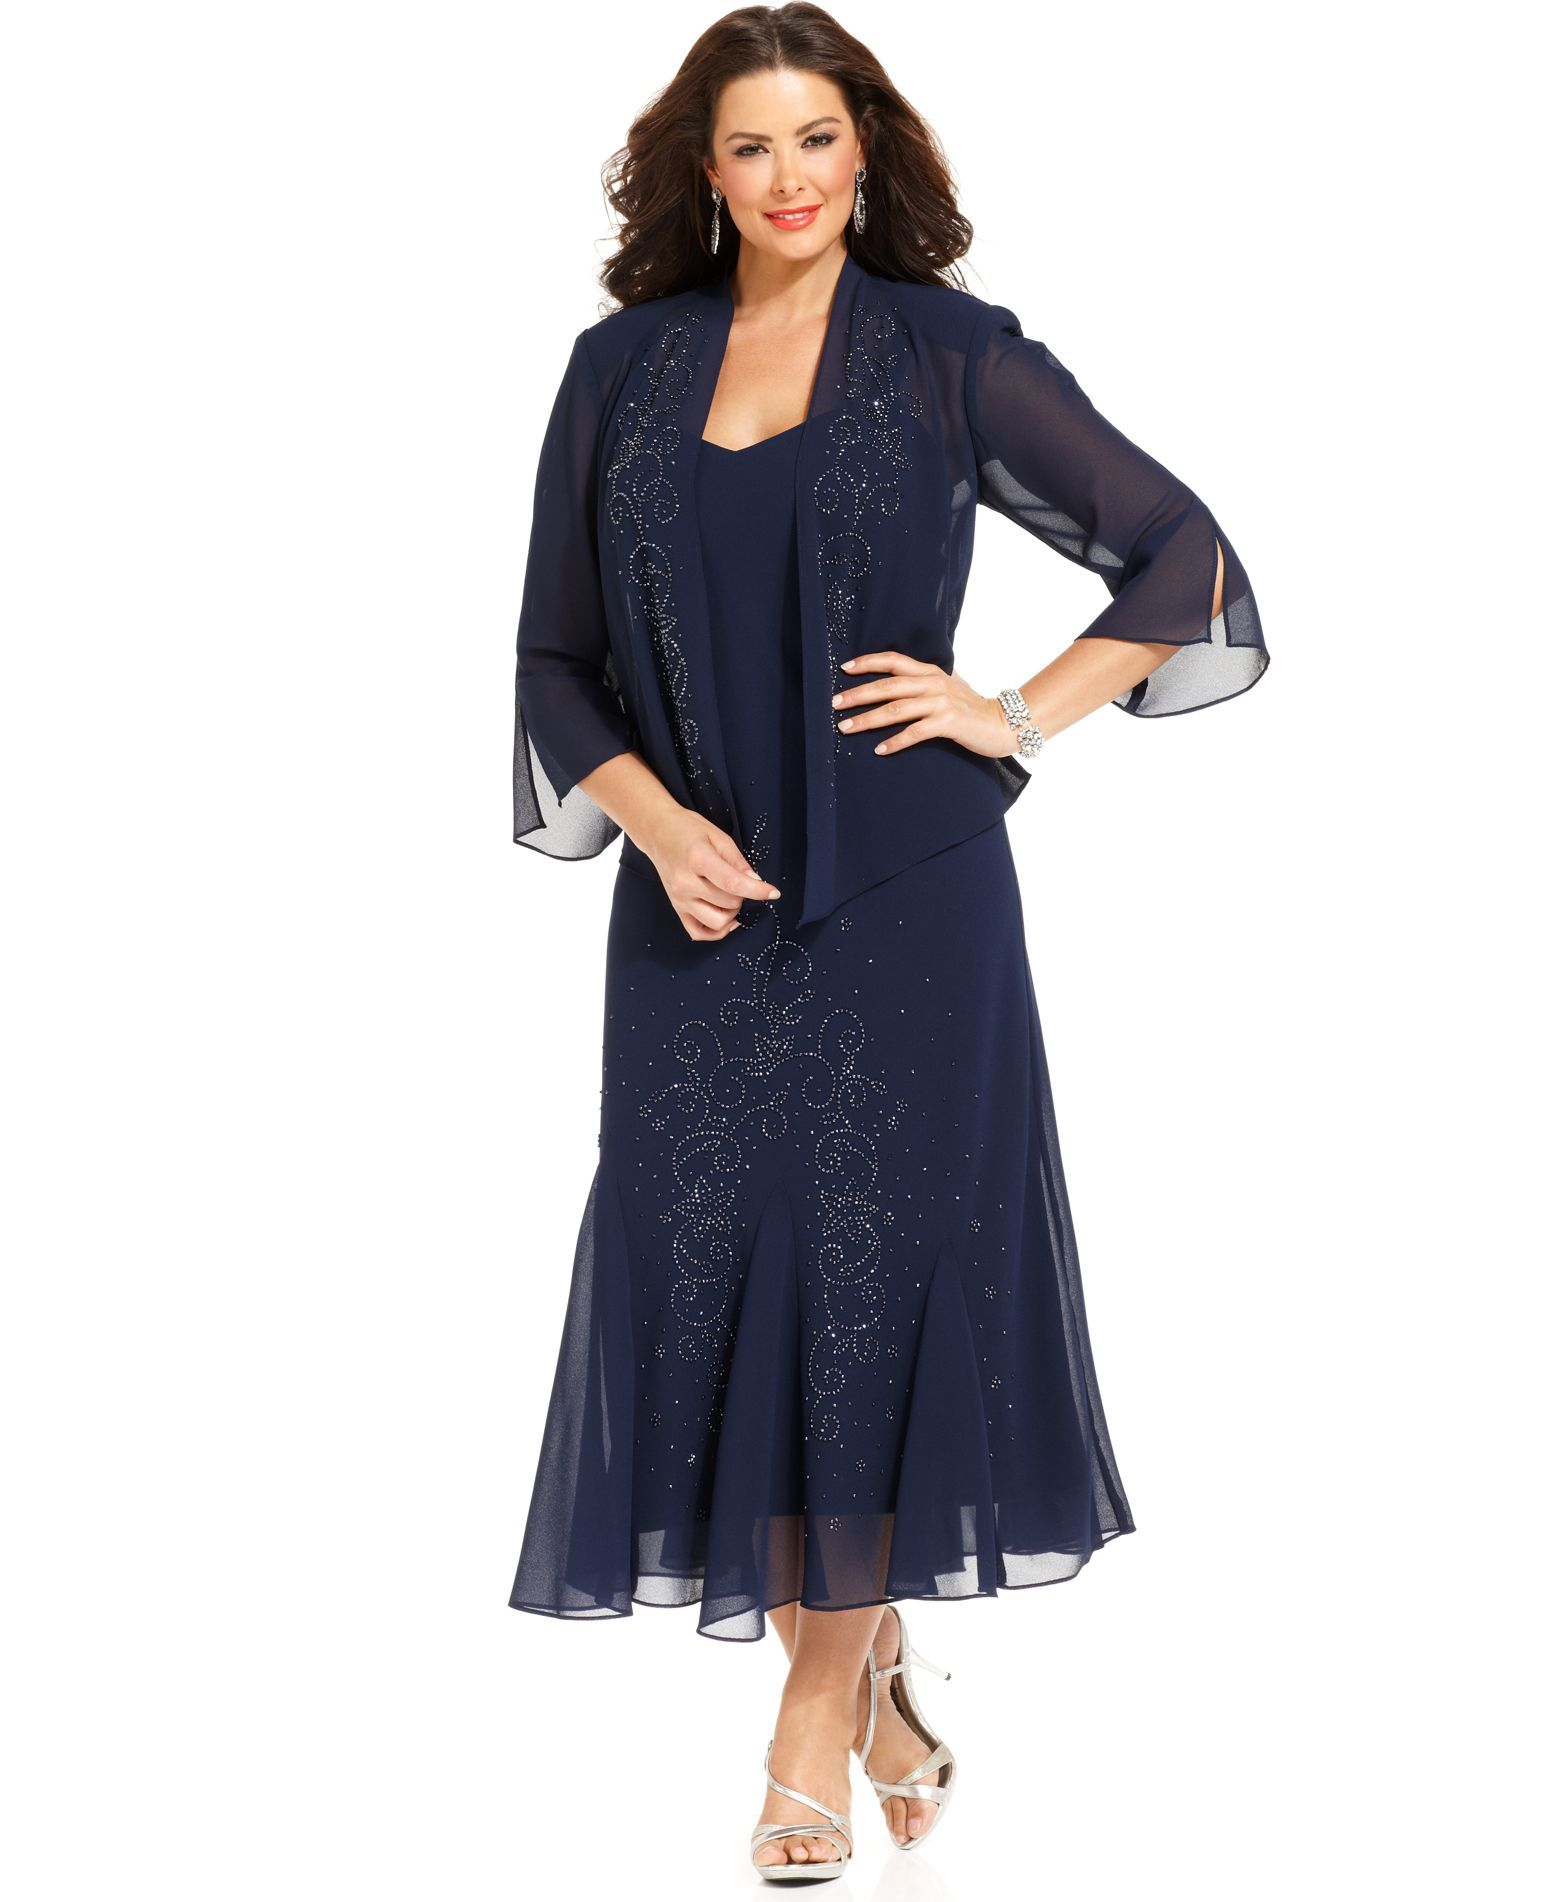 R&M Richards Plus Size Beaded V-Neck Dress and Jacket | Starry ...